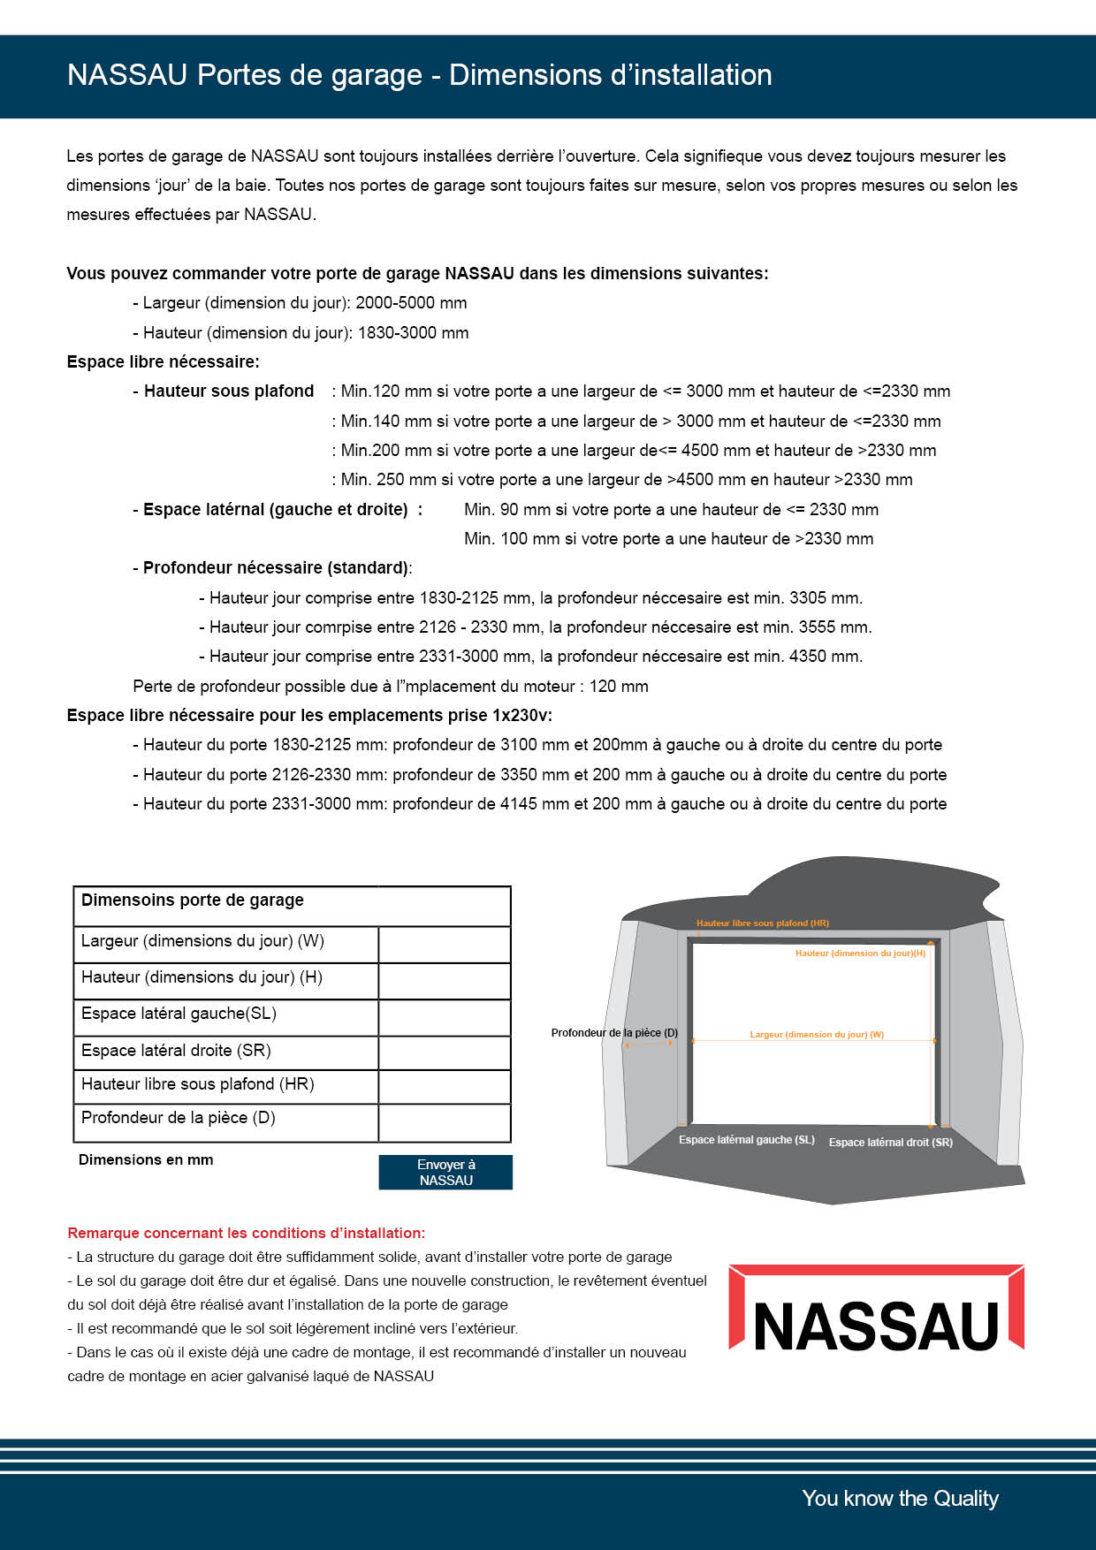 Nassau portes de garage - dimensions d'installation_version 2020